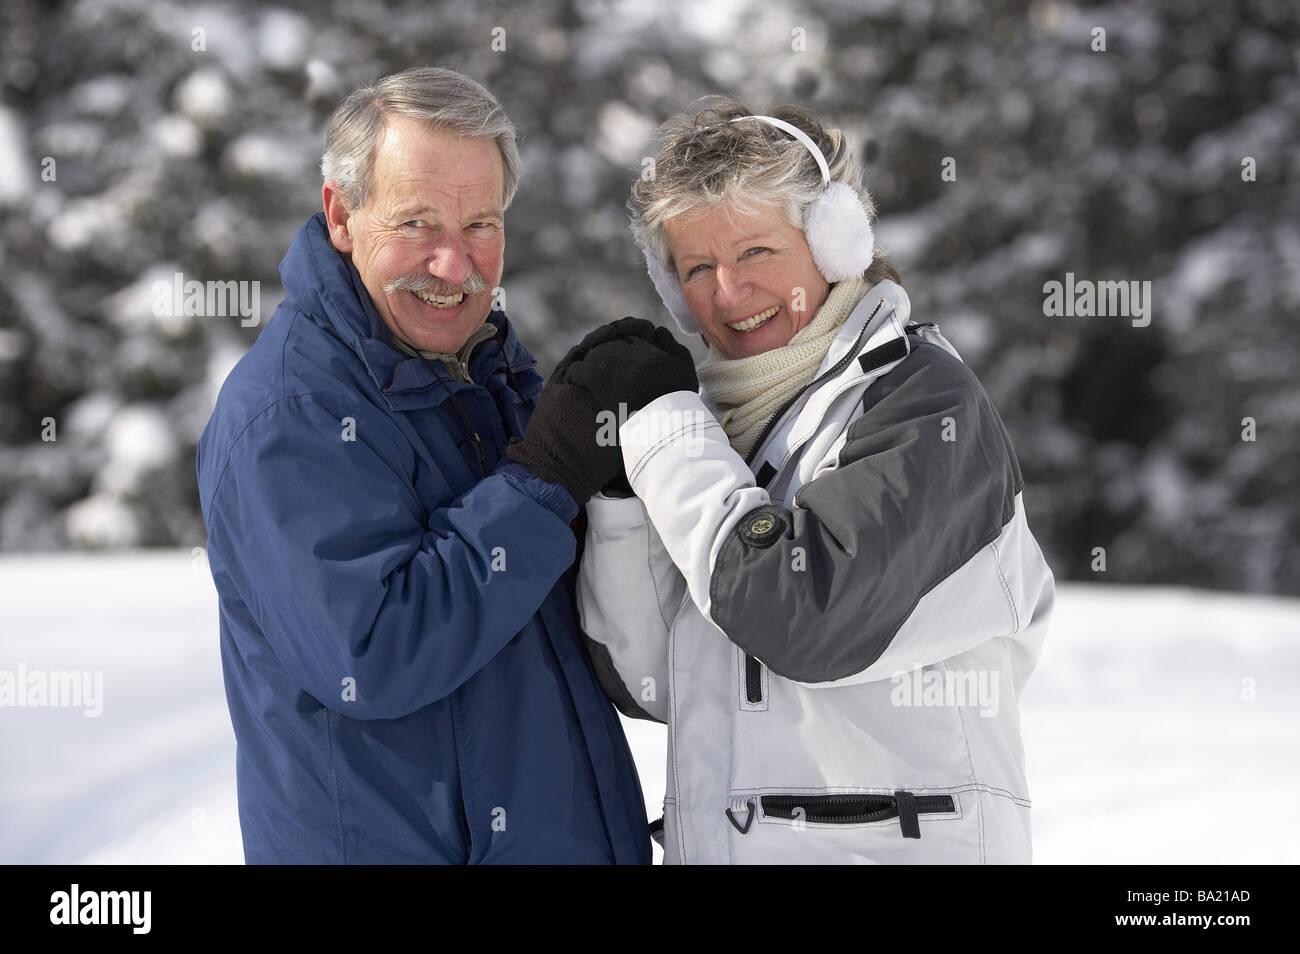 Senior-pairs winter-clothing semi-portrait laugh winters series people 60-70 years pair seniors winter-jackets gloves - Stock Image